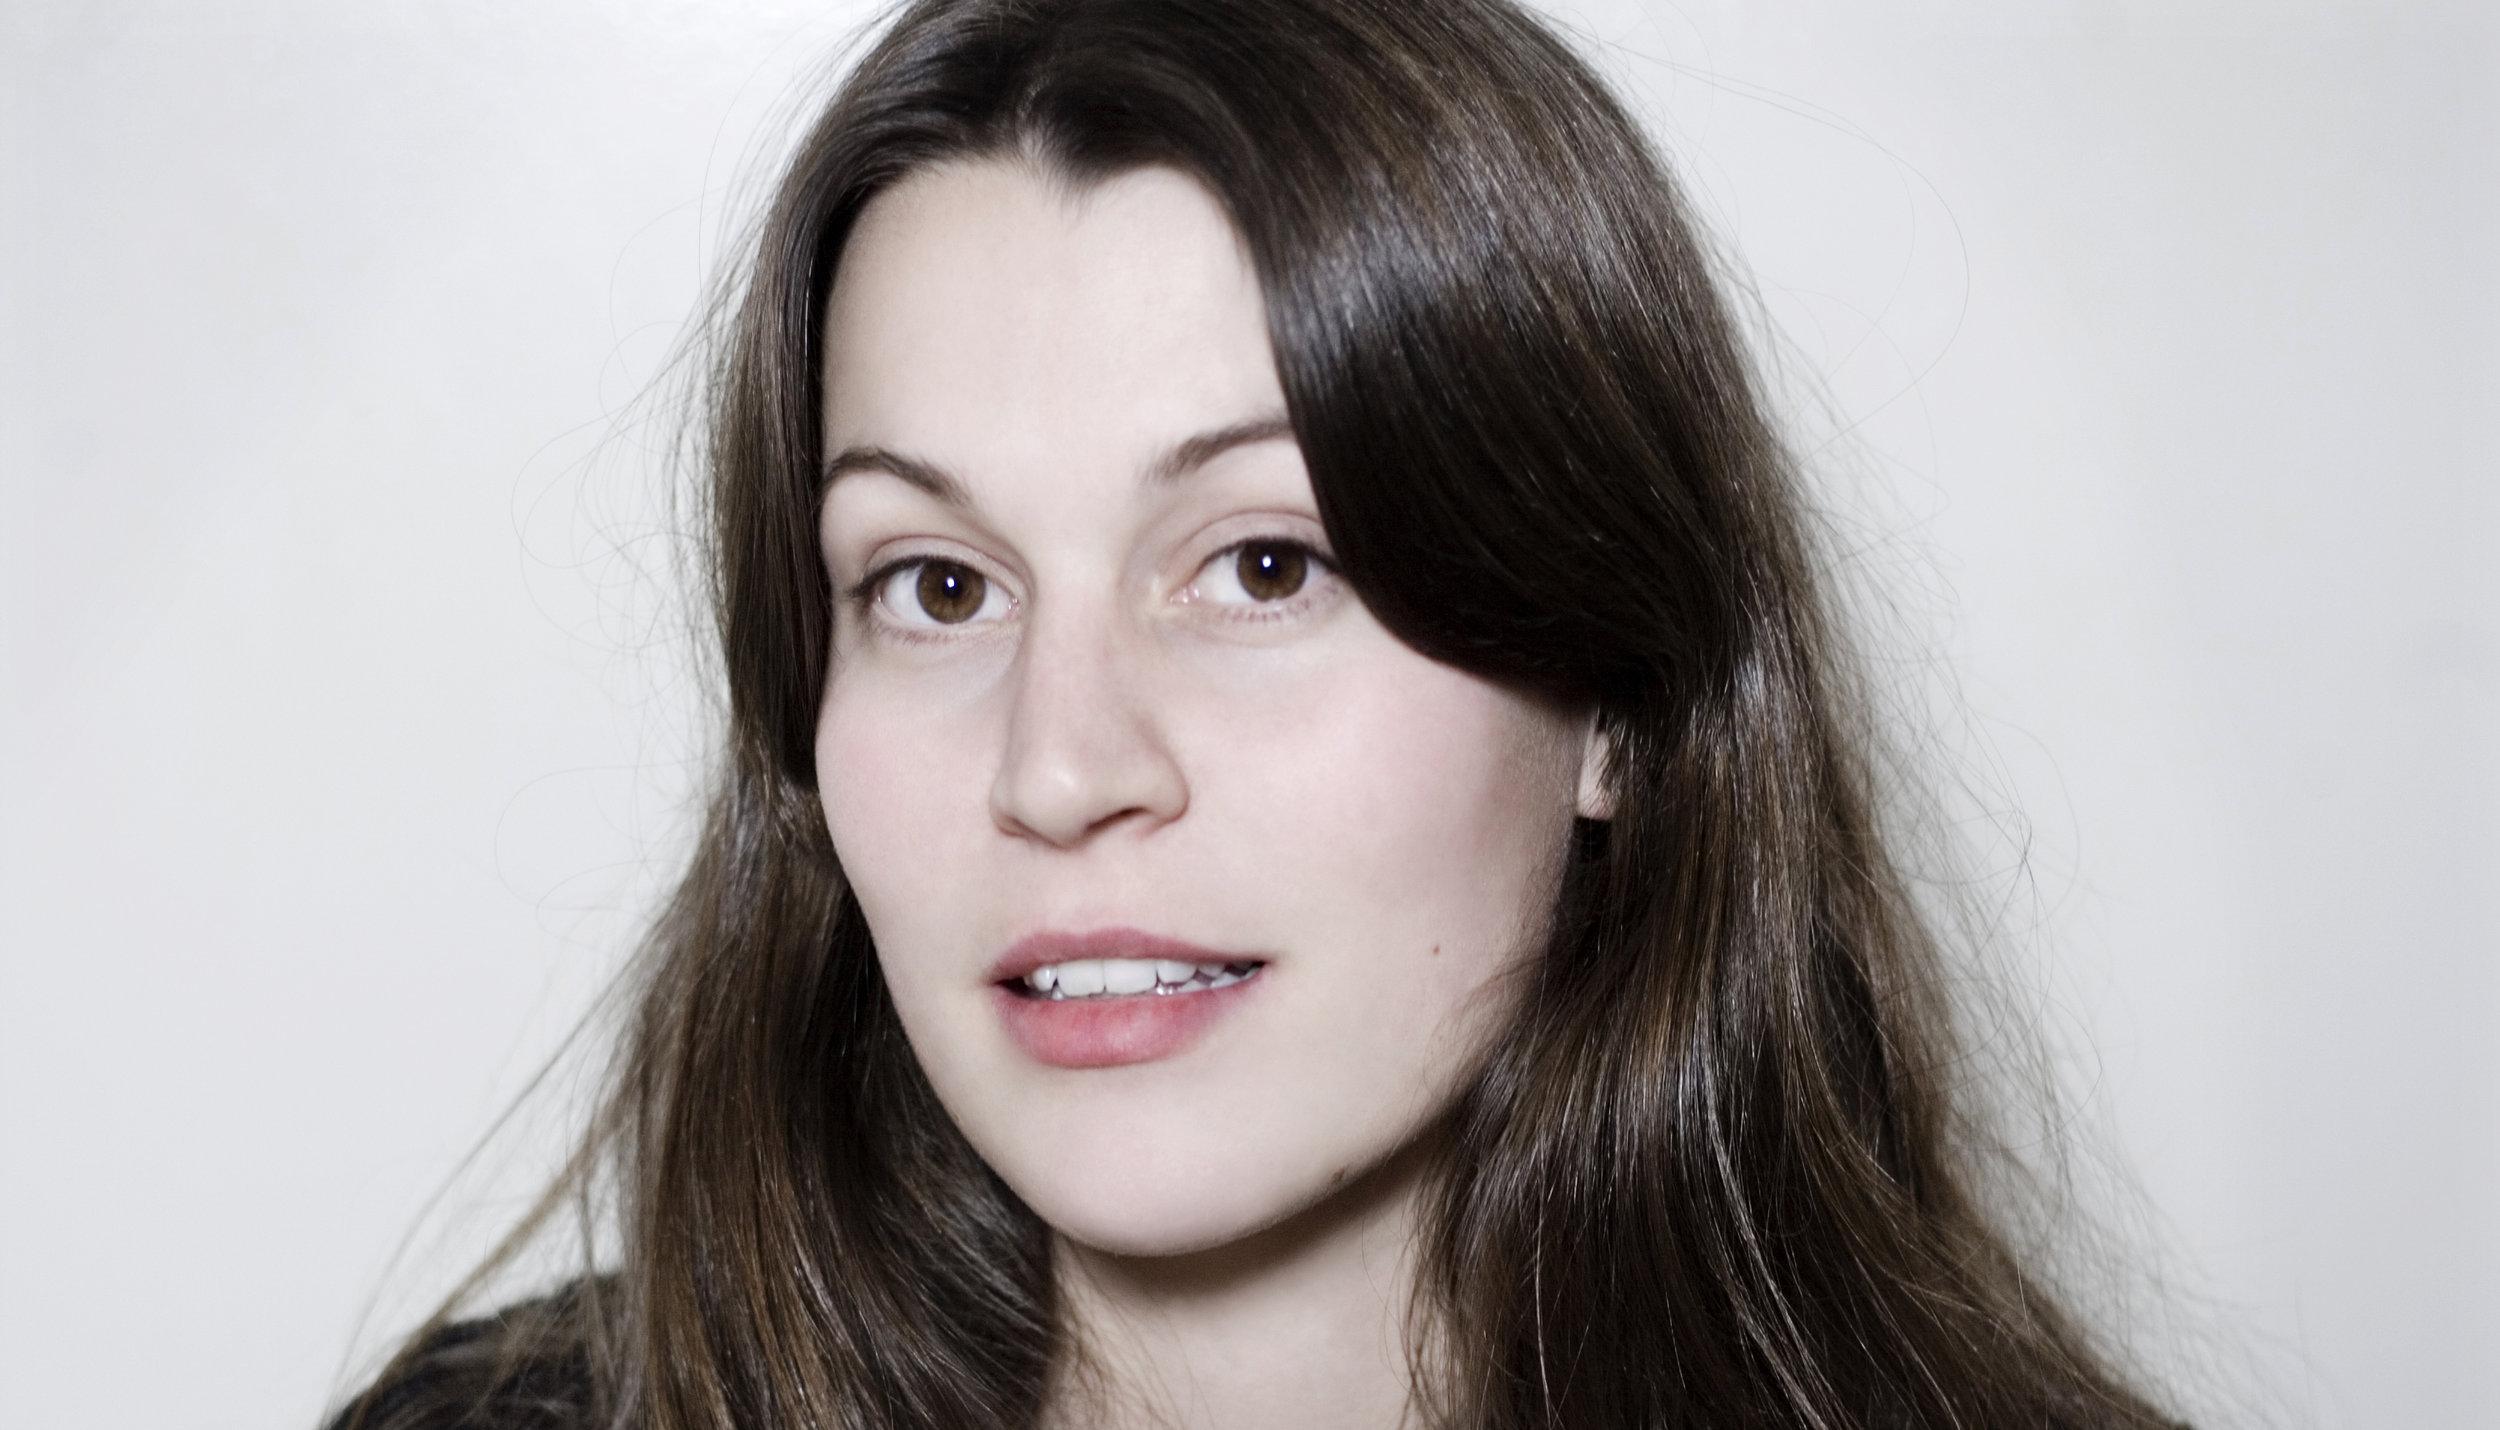 Katinka Fogh Vindelev